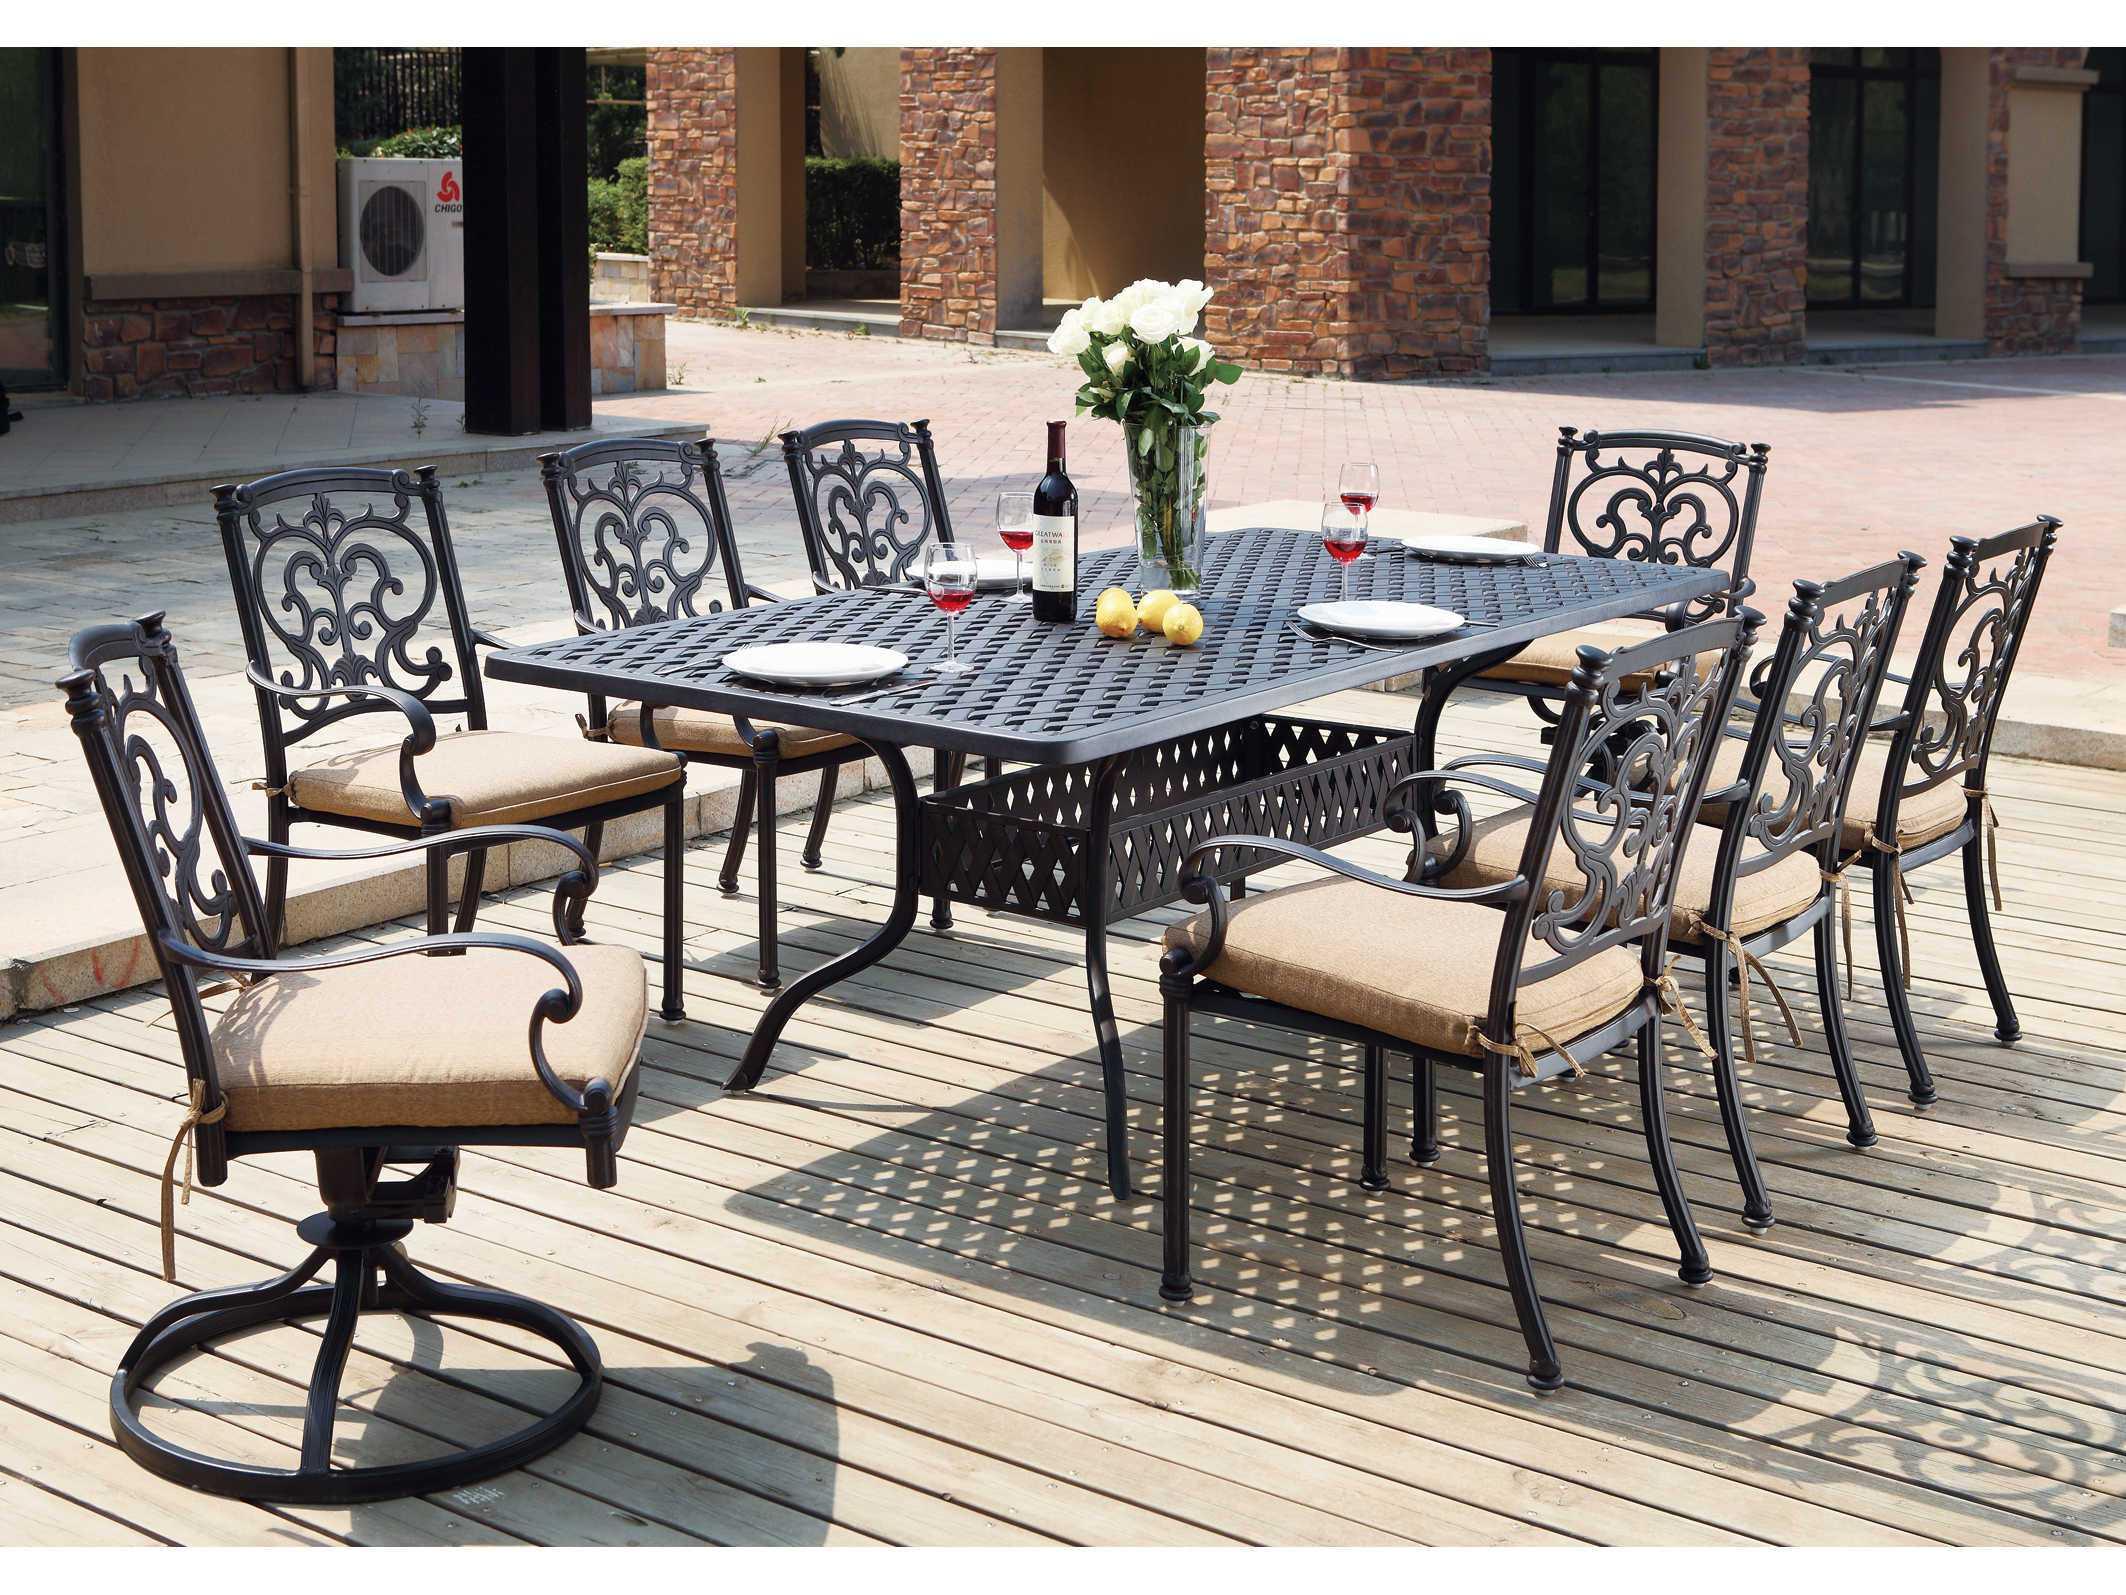 Darlee Outdoor Living Series 30 Cast Aluminum Antique Bronze 72 X 42 Rectangular Dining Table